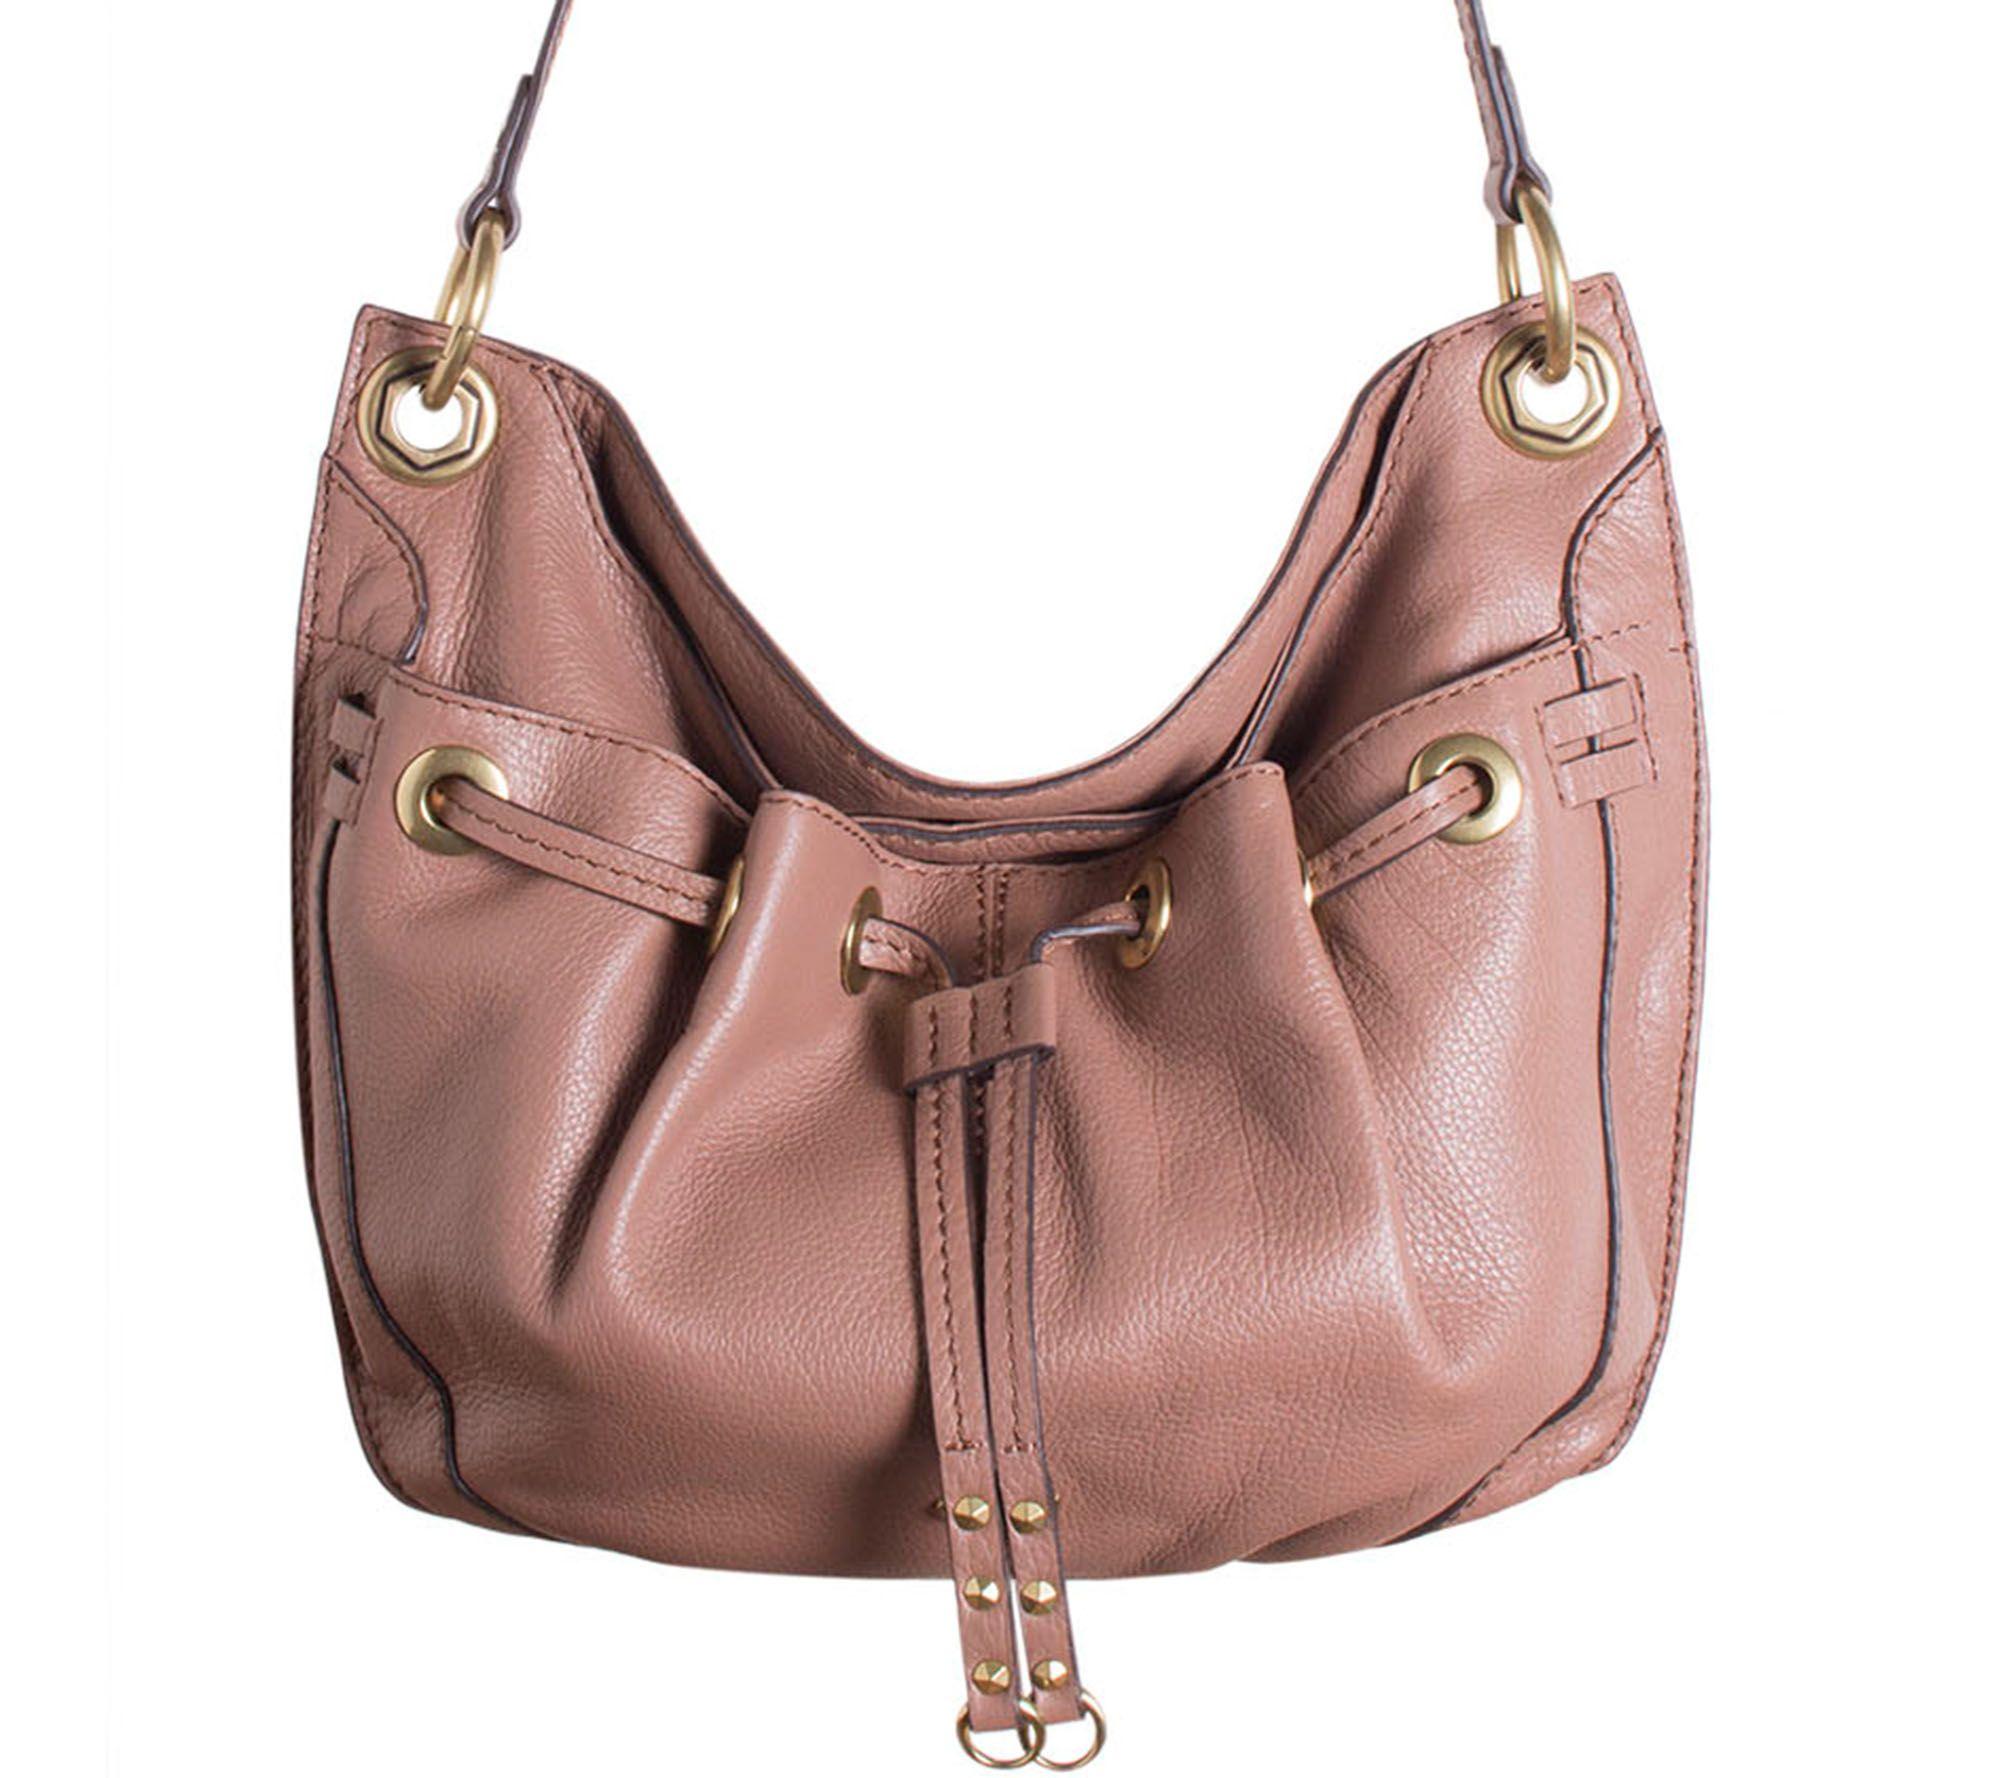 de76c88997f6 orYANY Italian Grain Leather Crossbody Bag - Celine - Page 1 — QVC.com